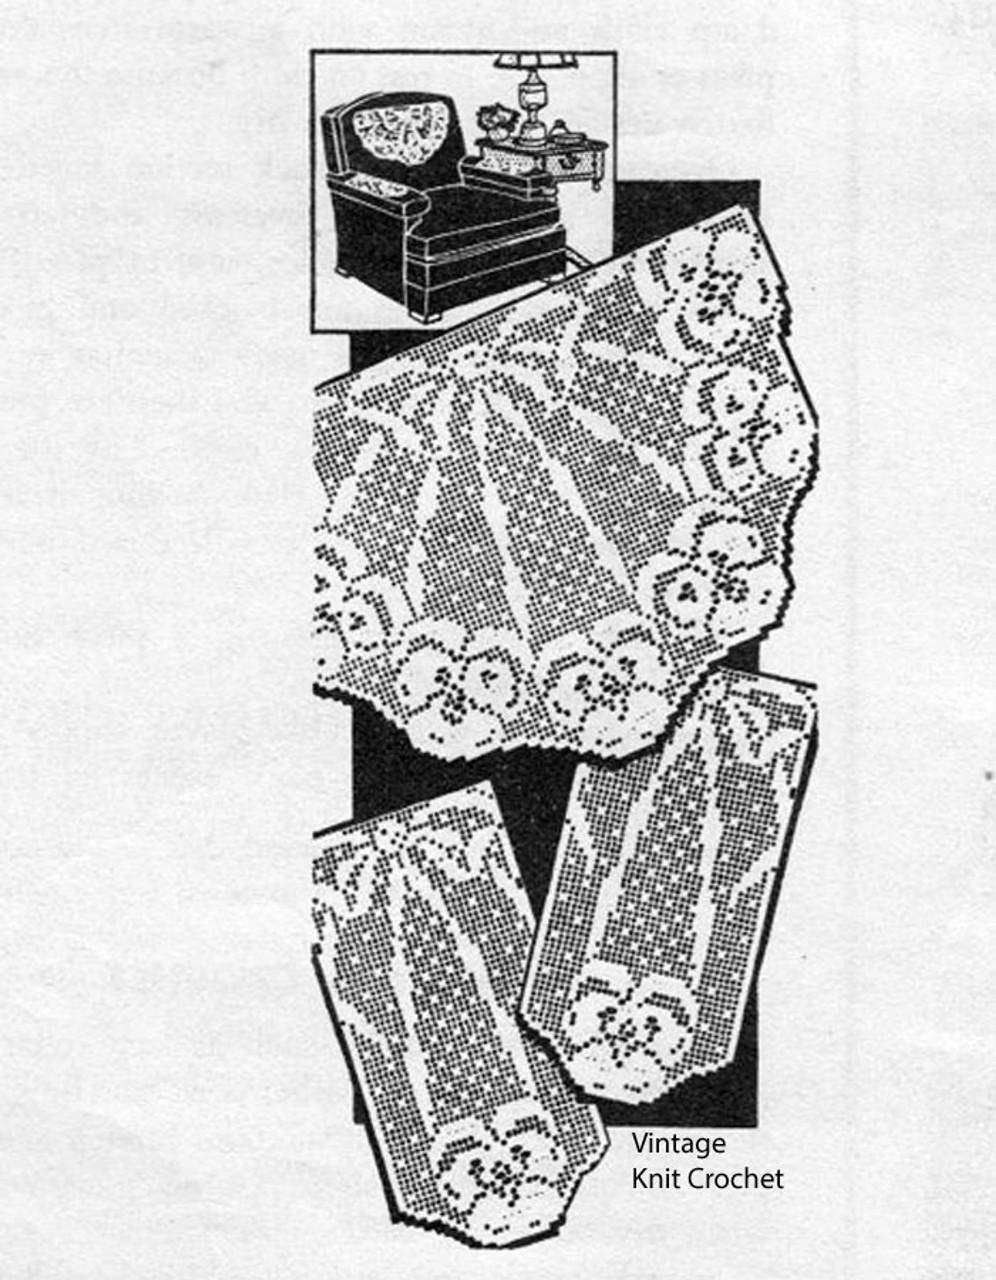 Filet Crochet Pansy Chair Doily Pattern, Laura Wheeler 516